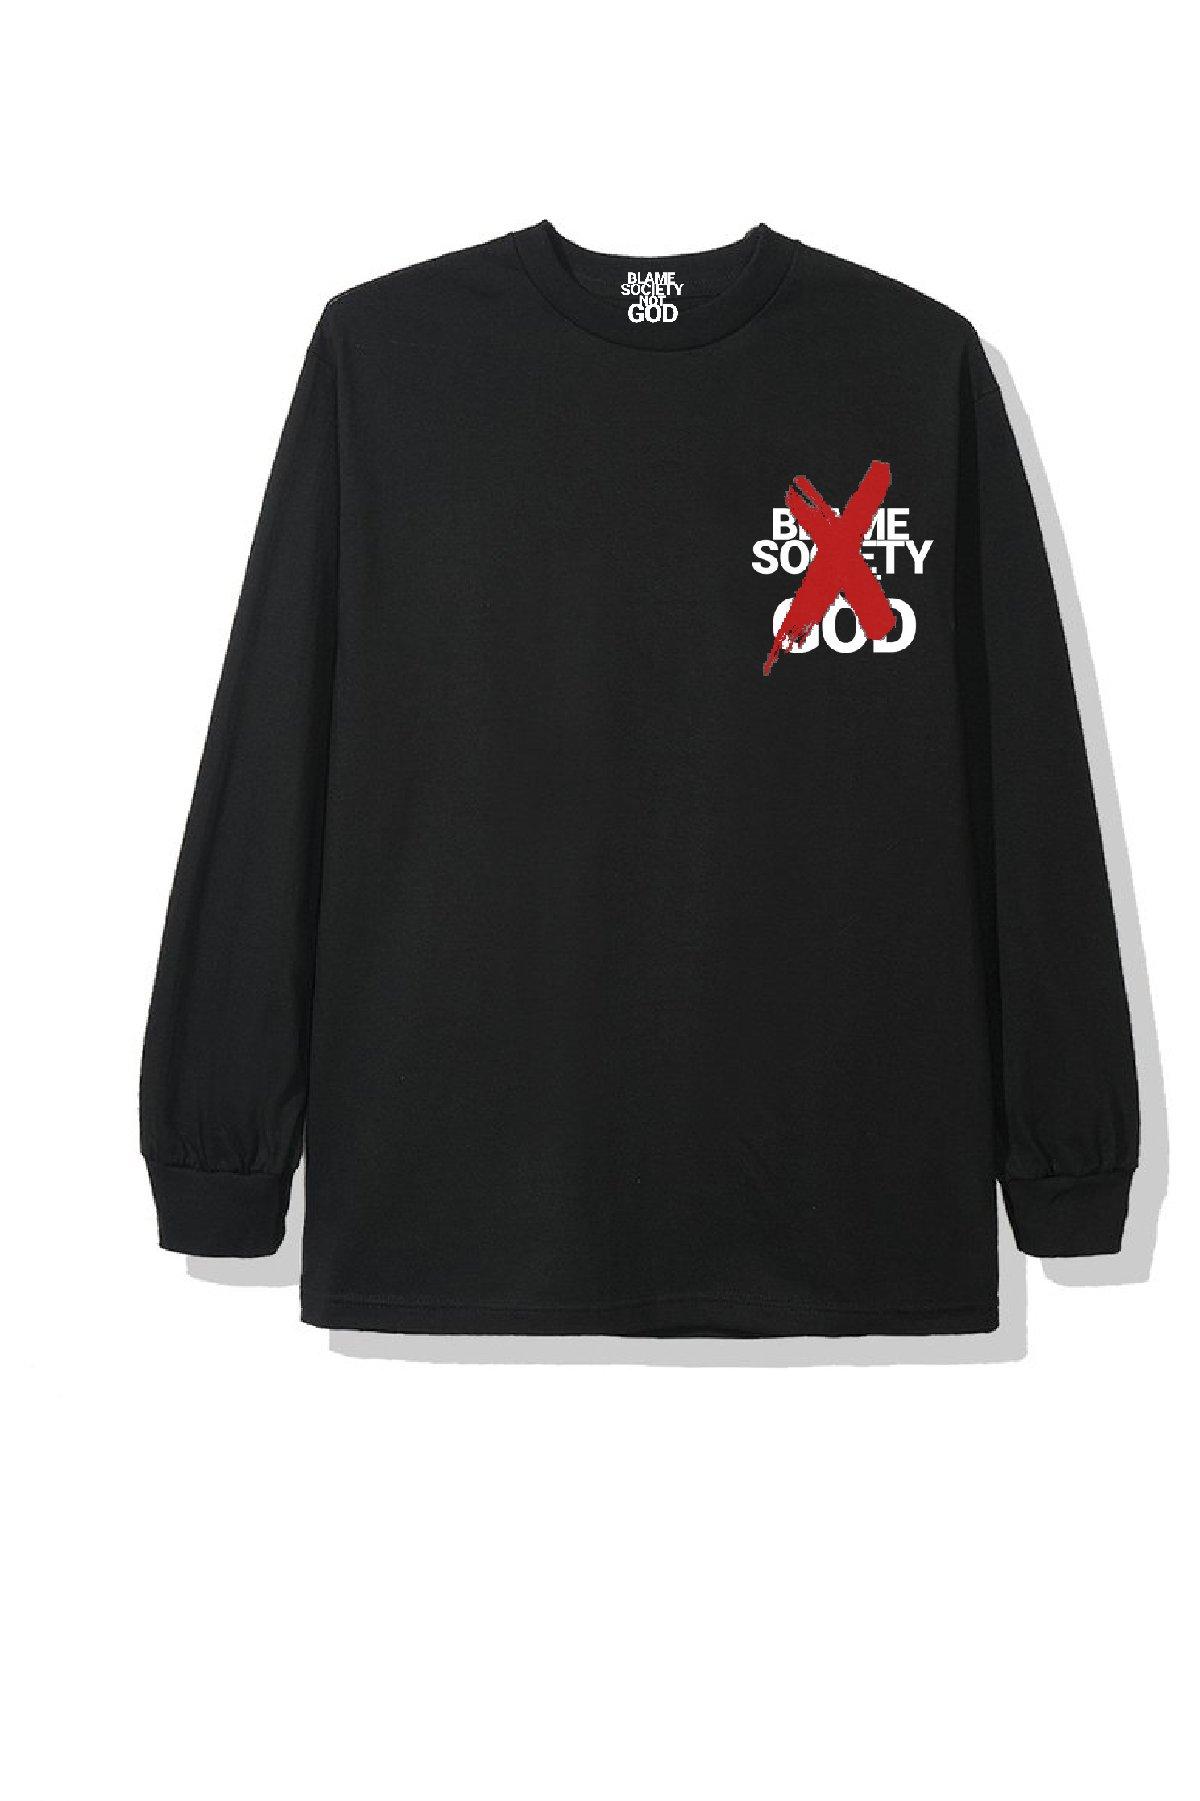 Image of BSNG  LOGO X 2 BLACK T-SHIRT